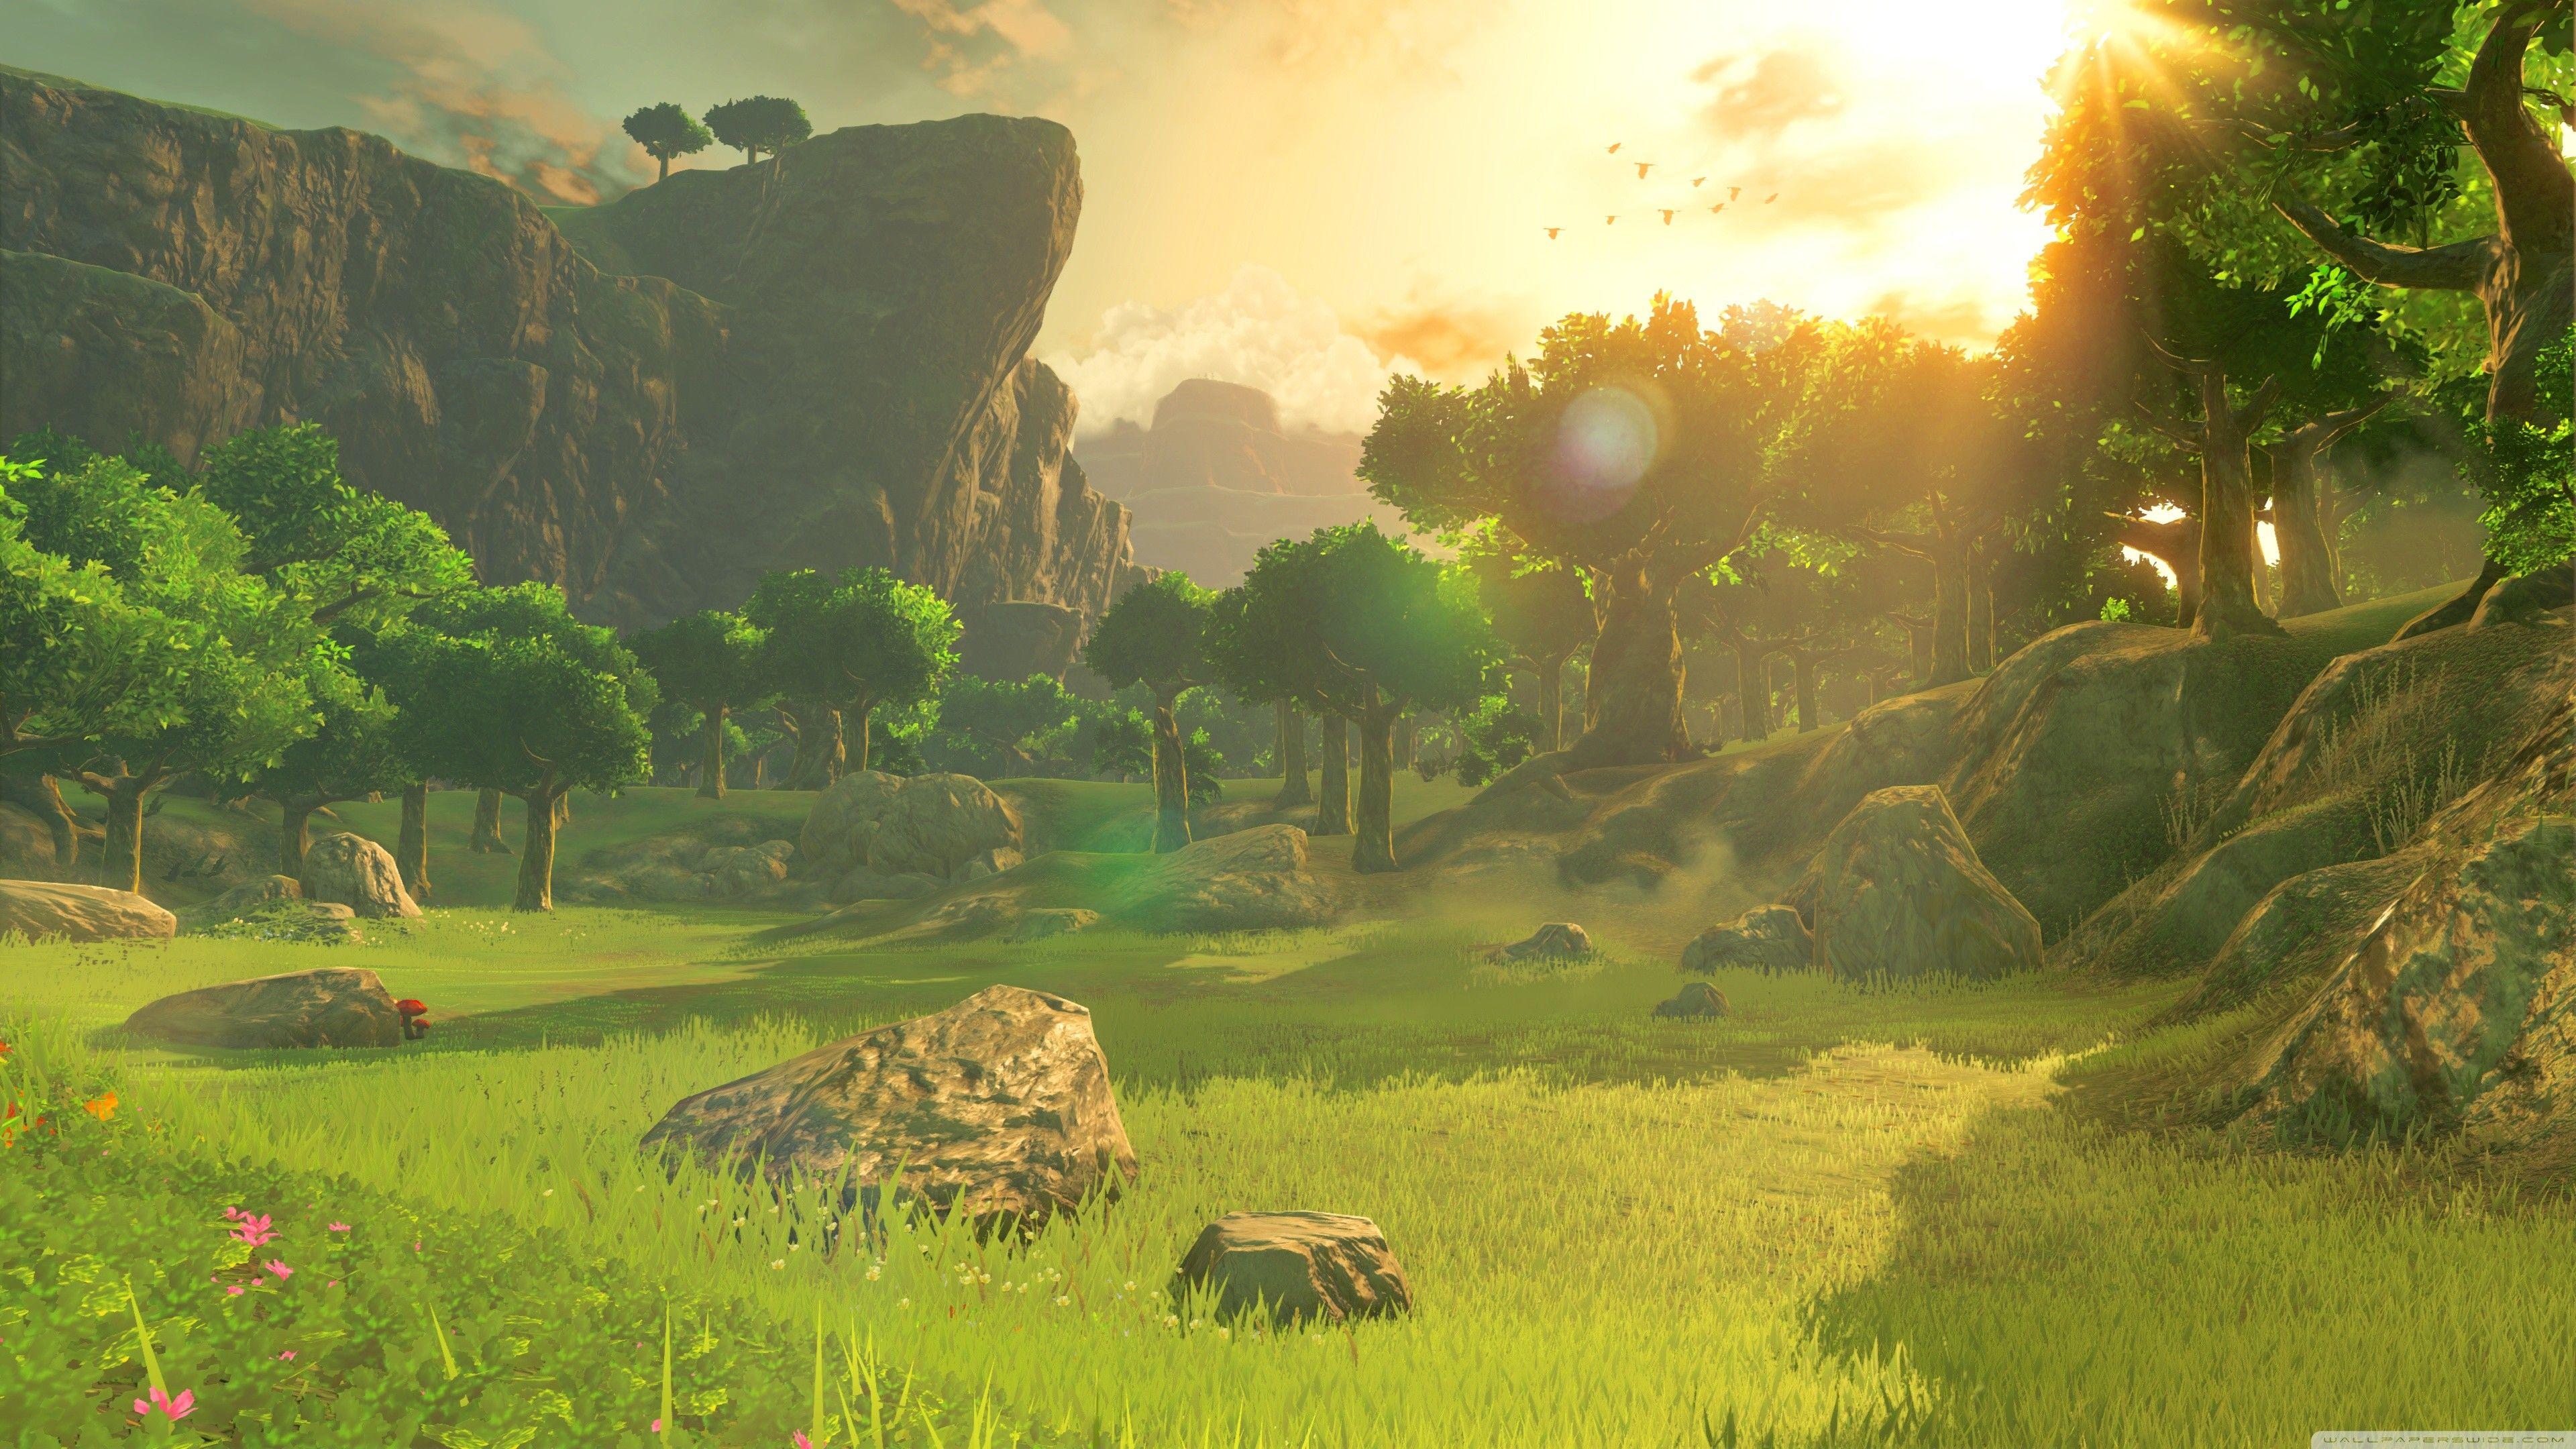 68 Zelda 4k Wallpapers On Wallpaperplay Anime Scenery Legend Of Zelda Breath Of The Wild